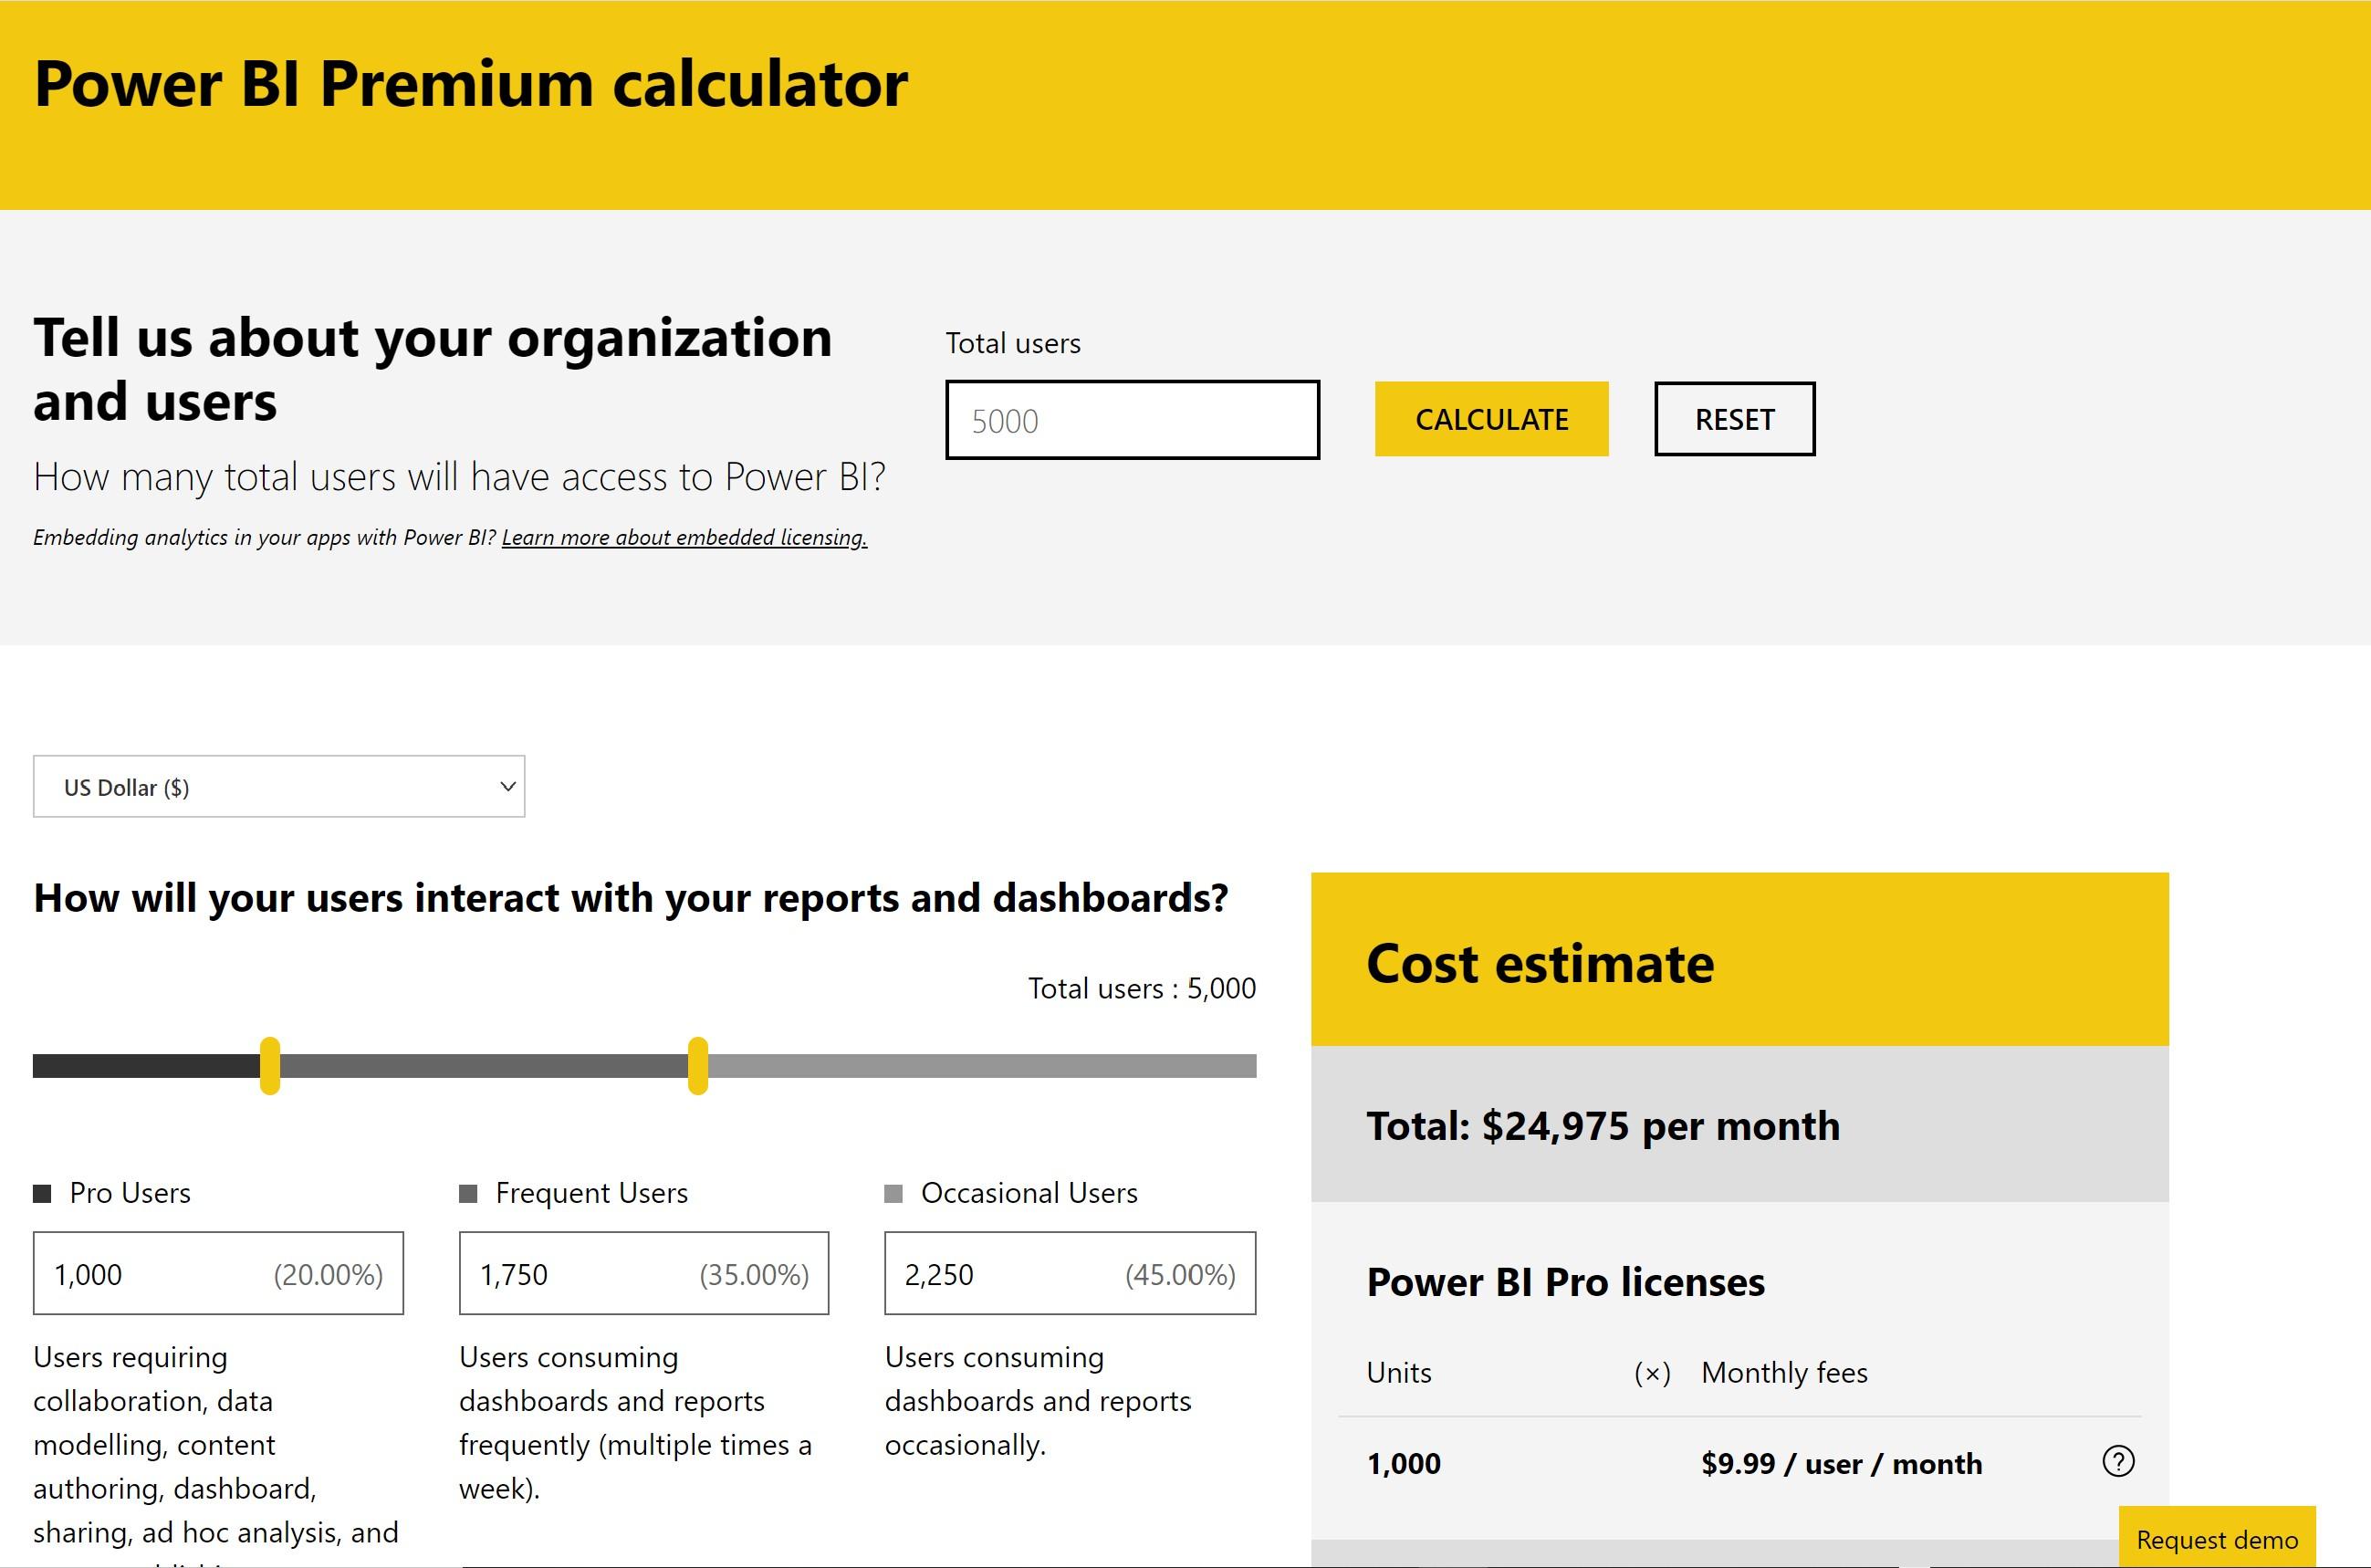 Power BI Premium Cost Calculator